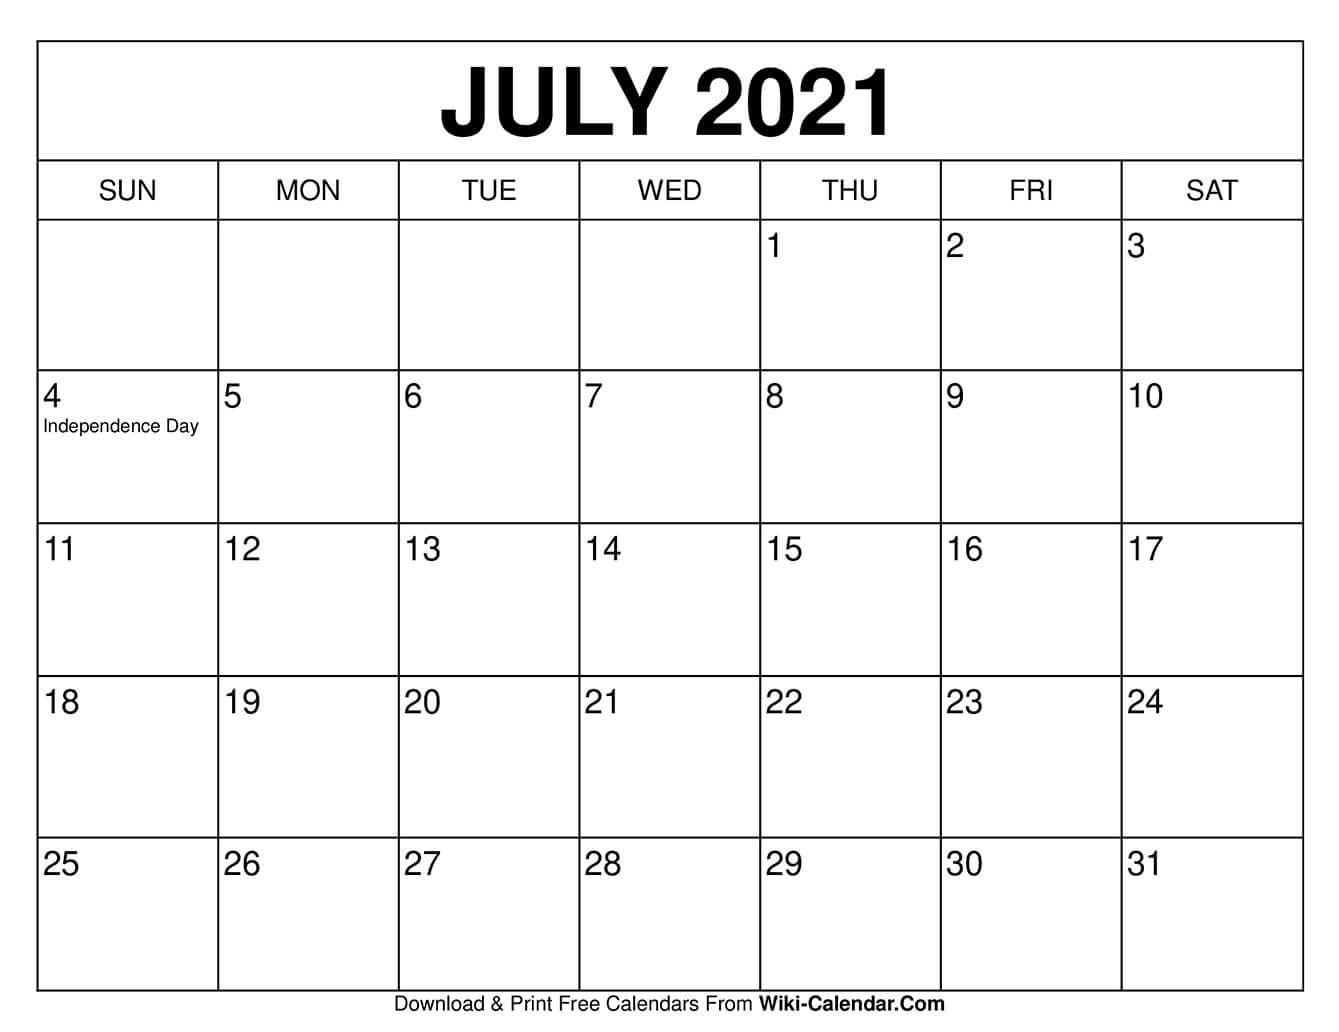 July 2021 Calendar - Free Download Printable Calendar